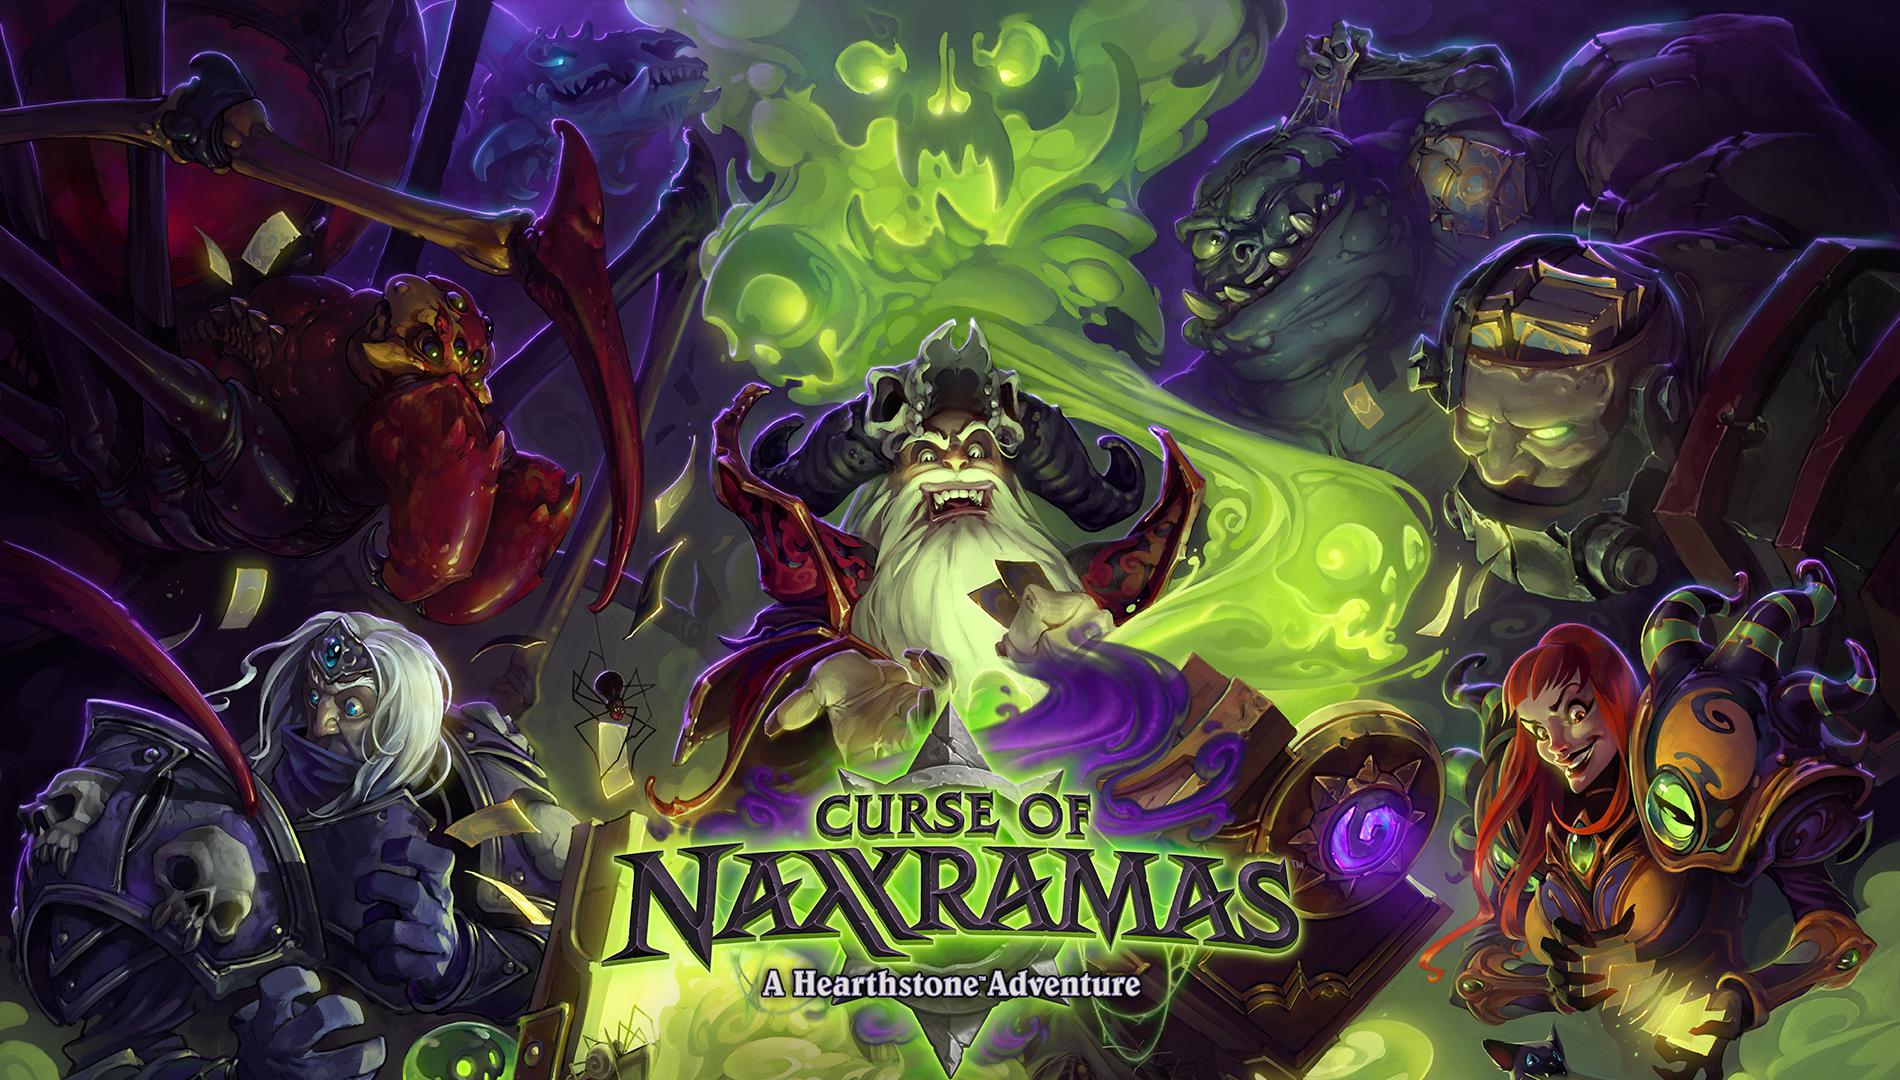 Hearthstone getting single-player Curse of Naxxramas adventure mode